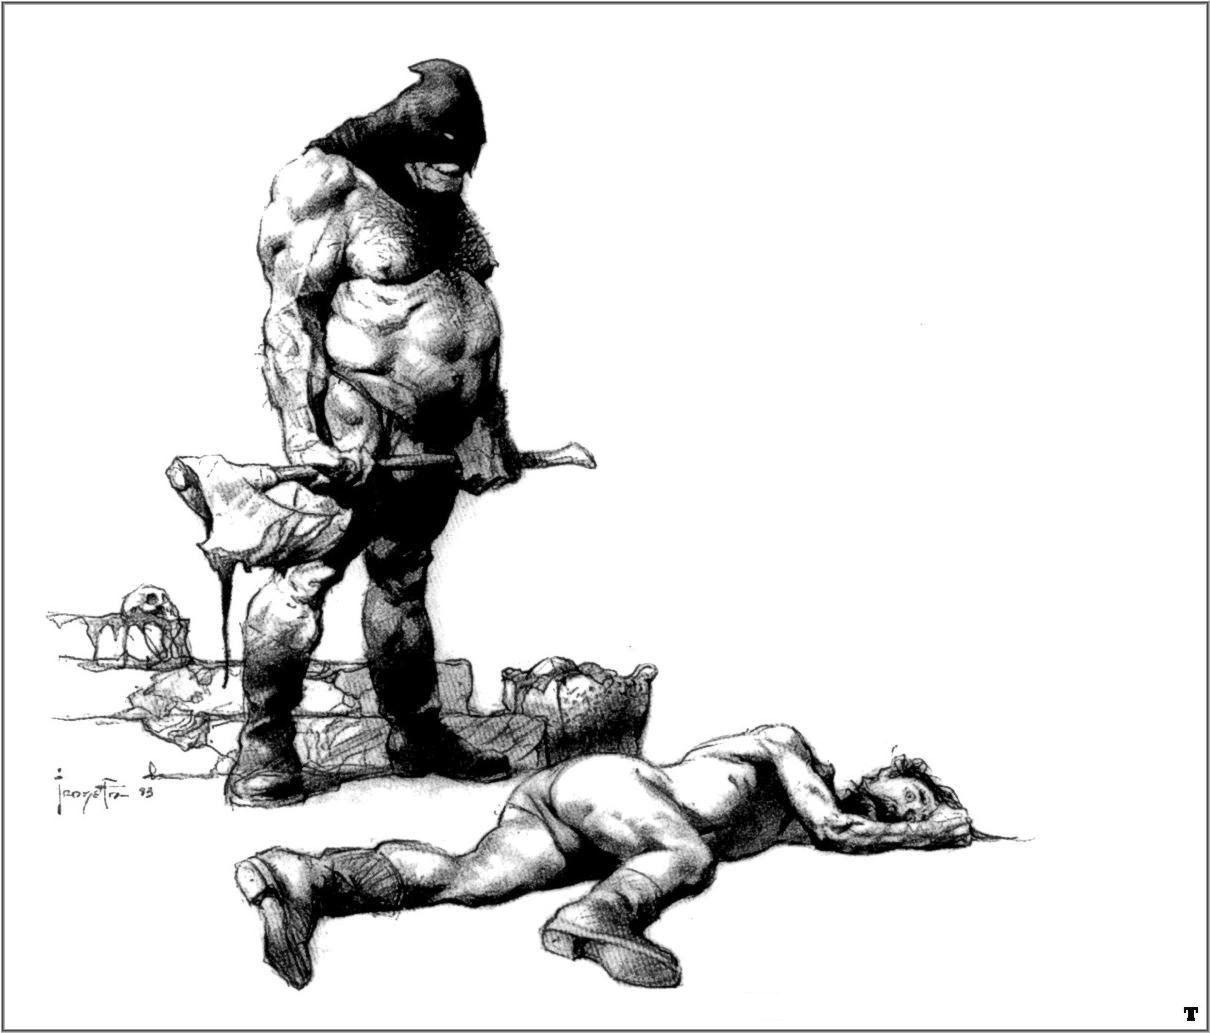 Aragorn et les 5 Armées - Armée de Mirkwood Update - Page 3 D39f113c91ad3b7de8e4504ed885d178